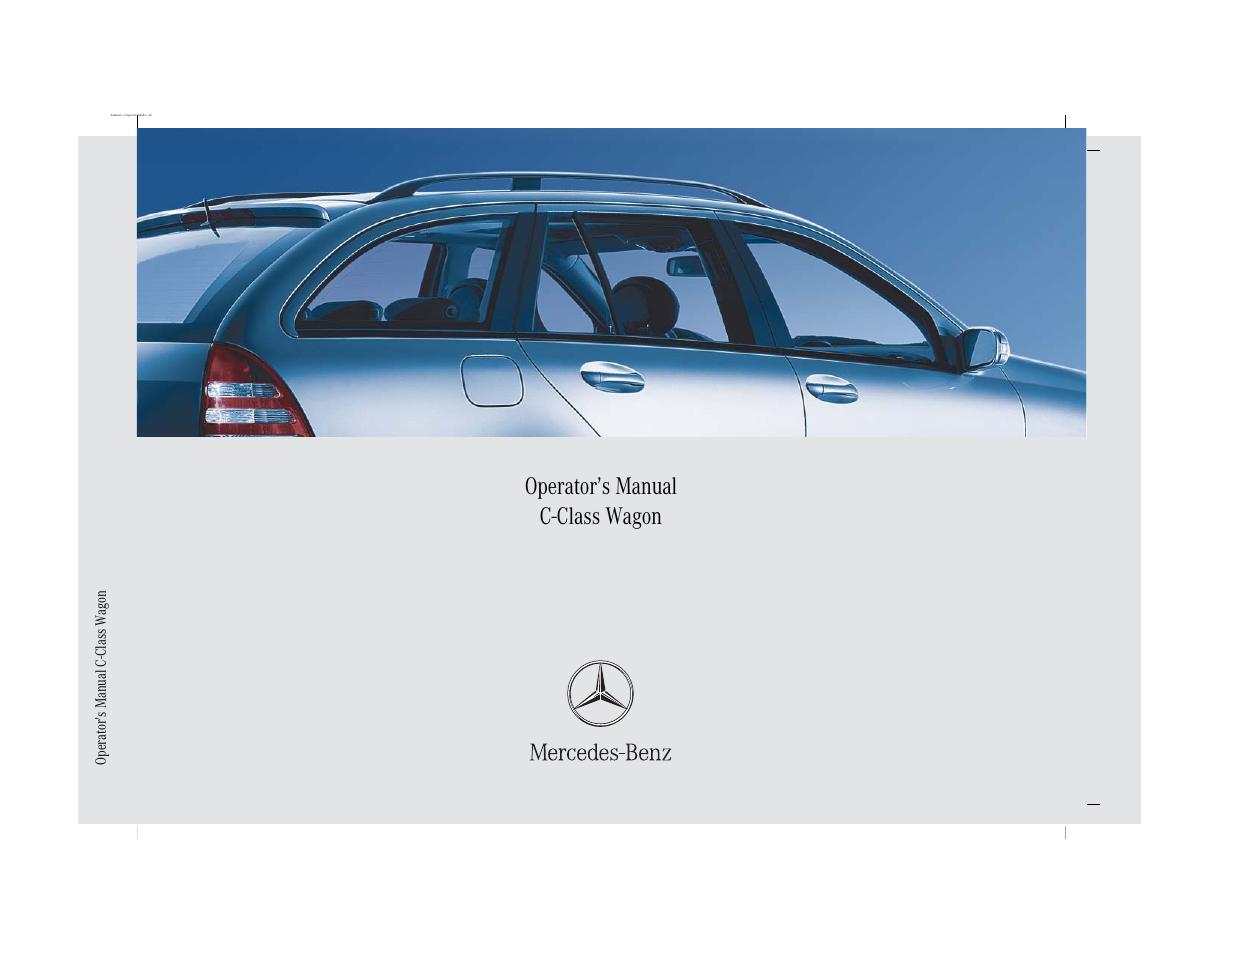 eclass interactive owners manual start mercedesbenz 7144079 rh kiavenga info Mercedes Manual Transmission mercedes benz interactive owner's manual e-class